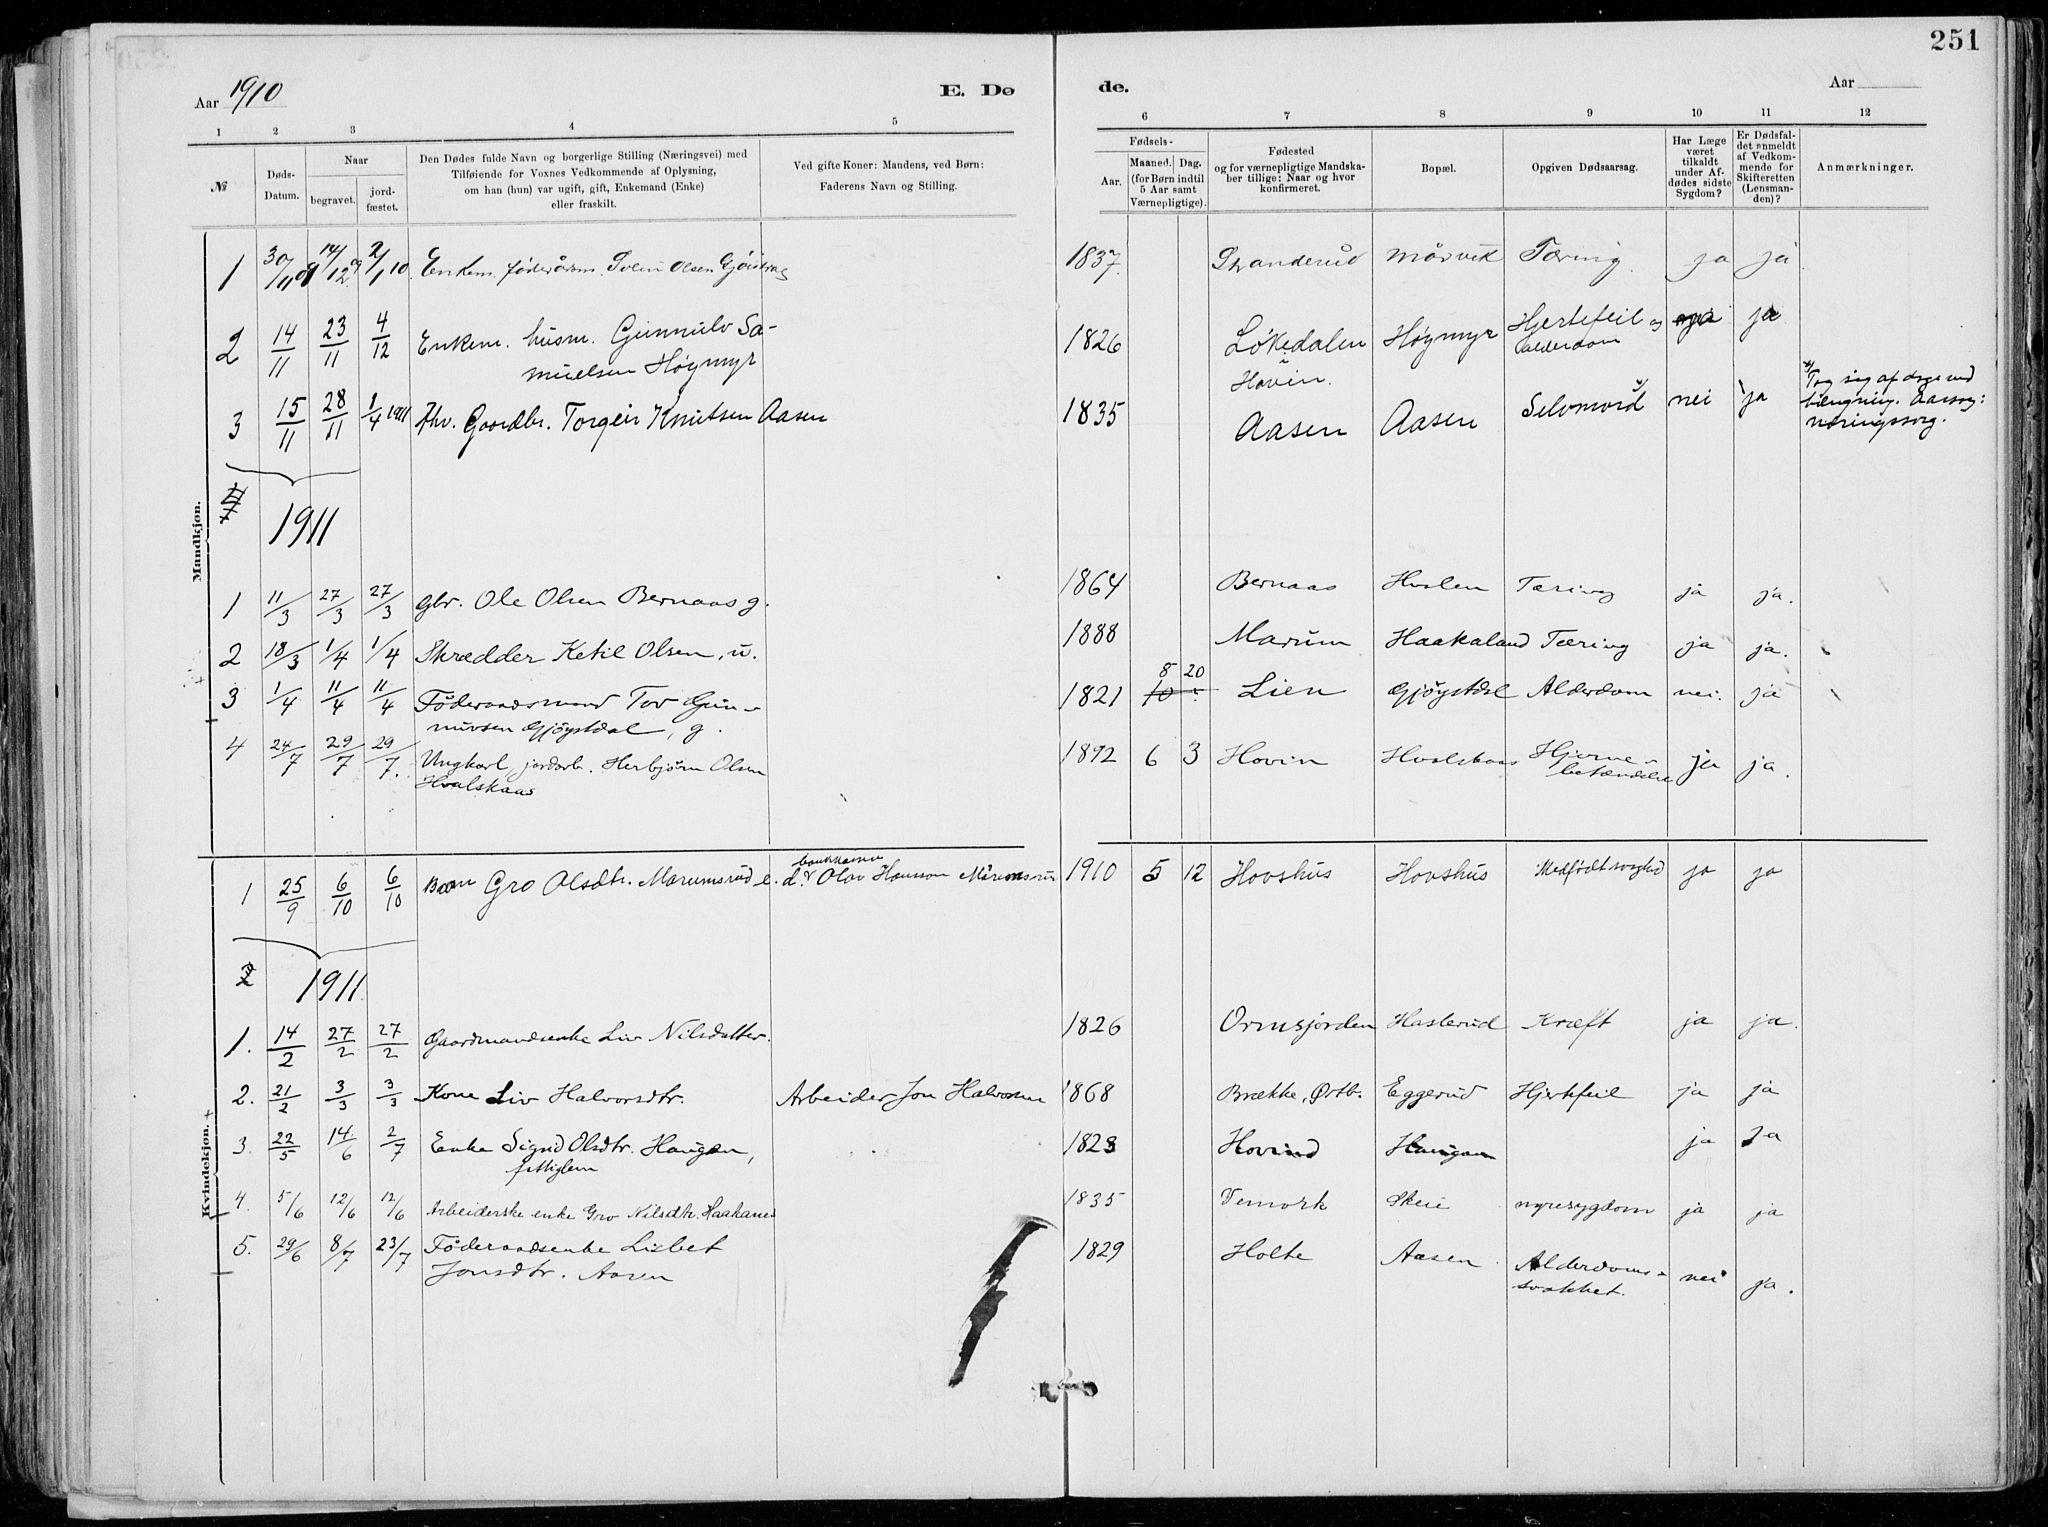 SAKO, Tinn kirkebøker, F/Fa/L0007: Ministerialbok nr. I 7, 1878-1922, s. 251